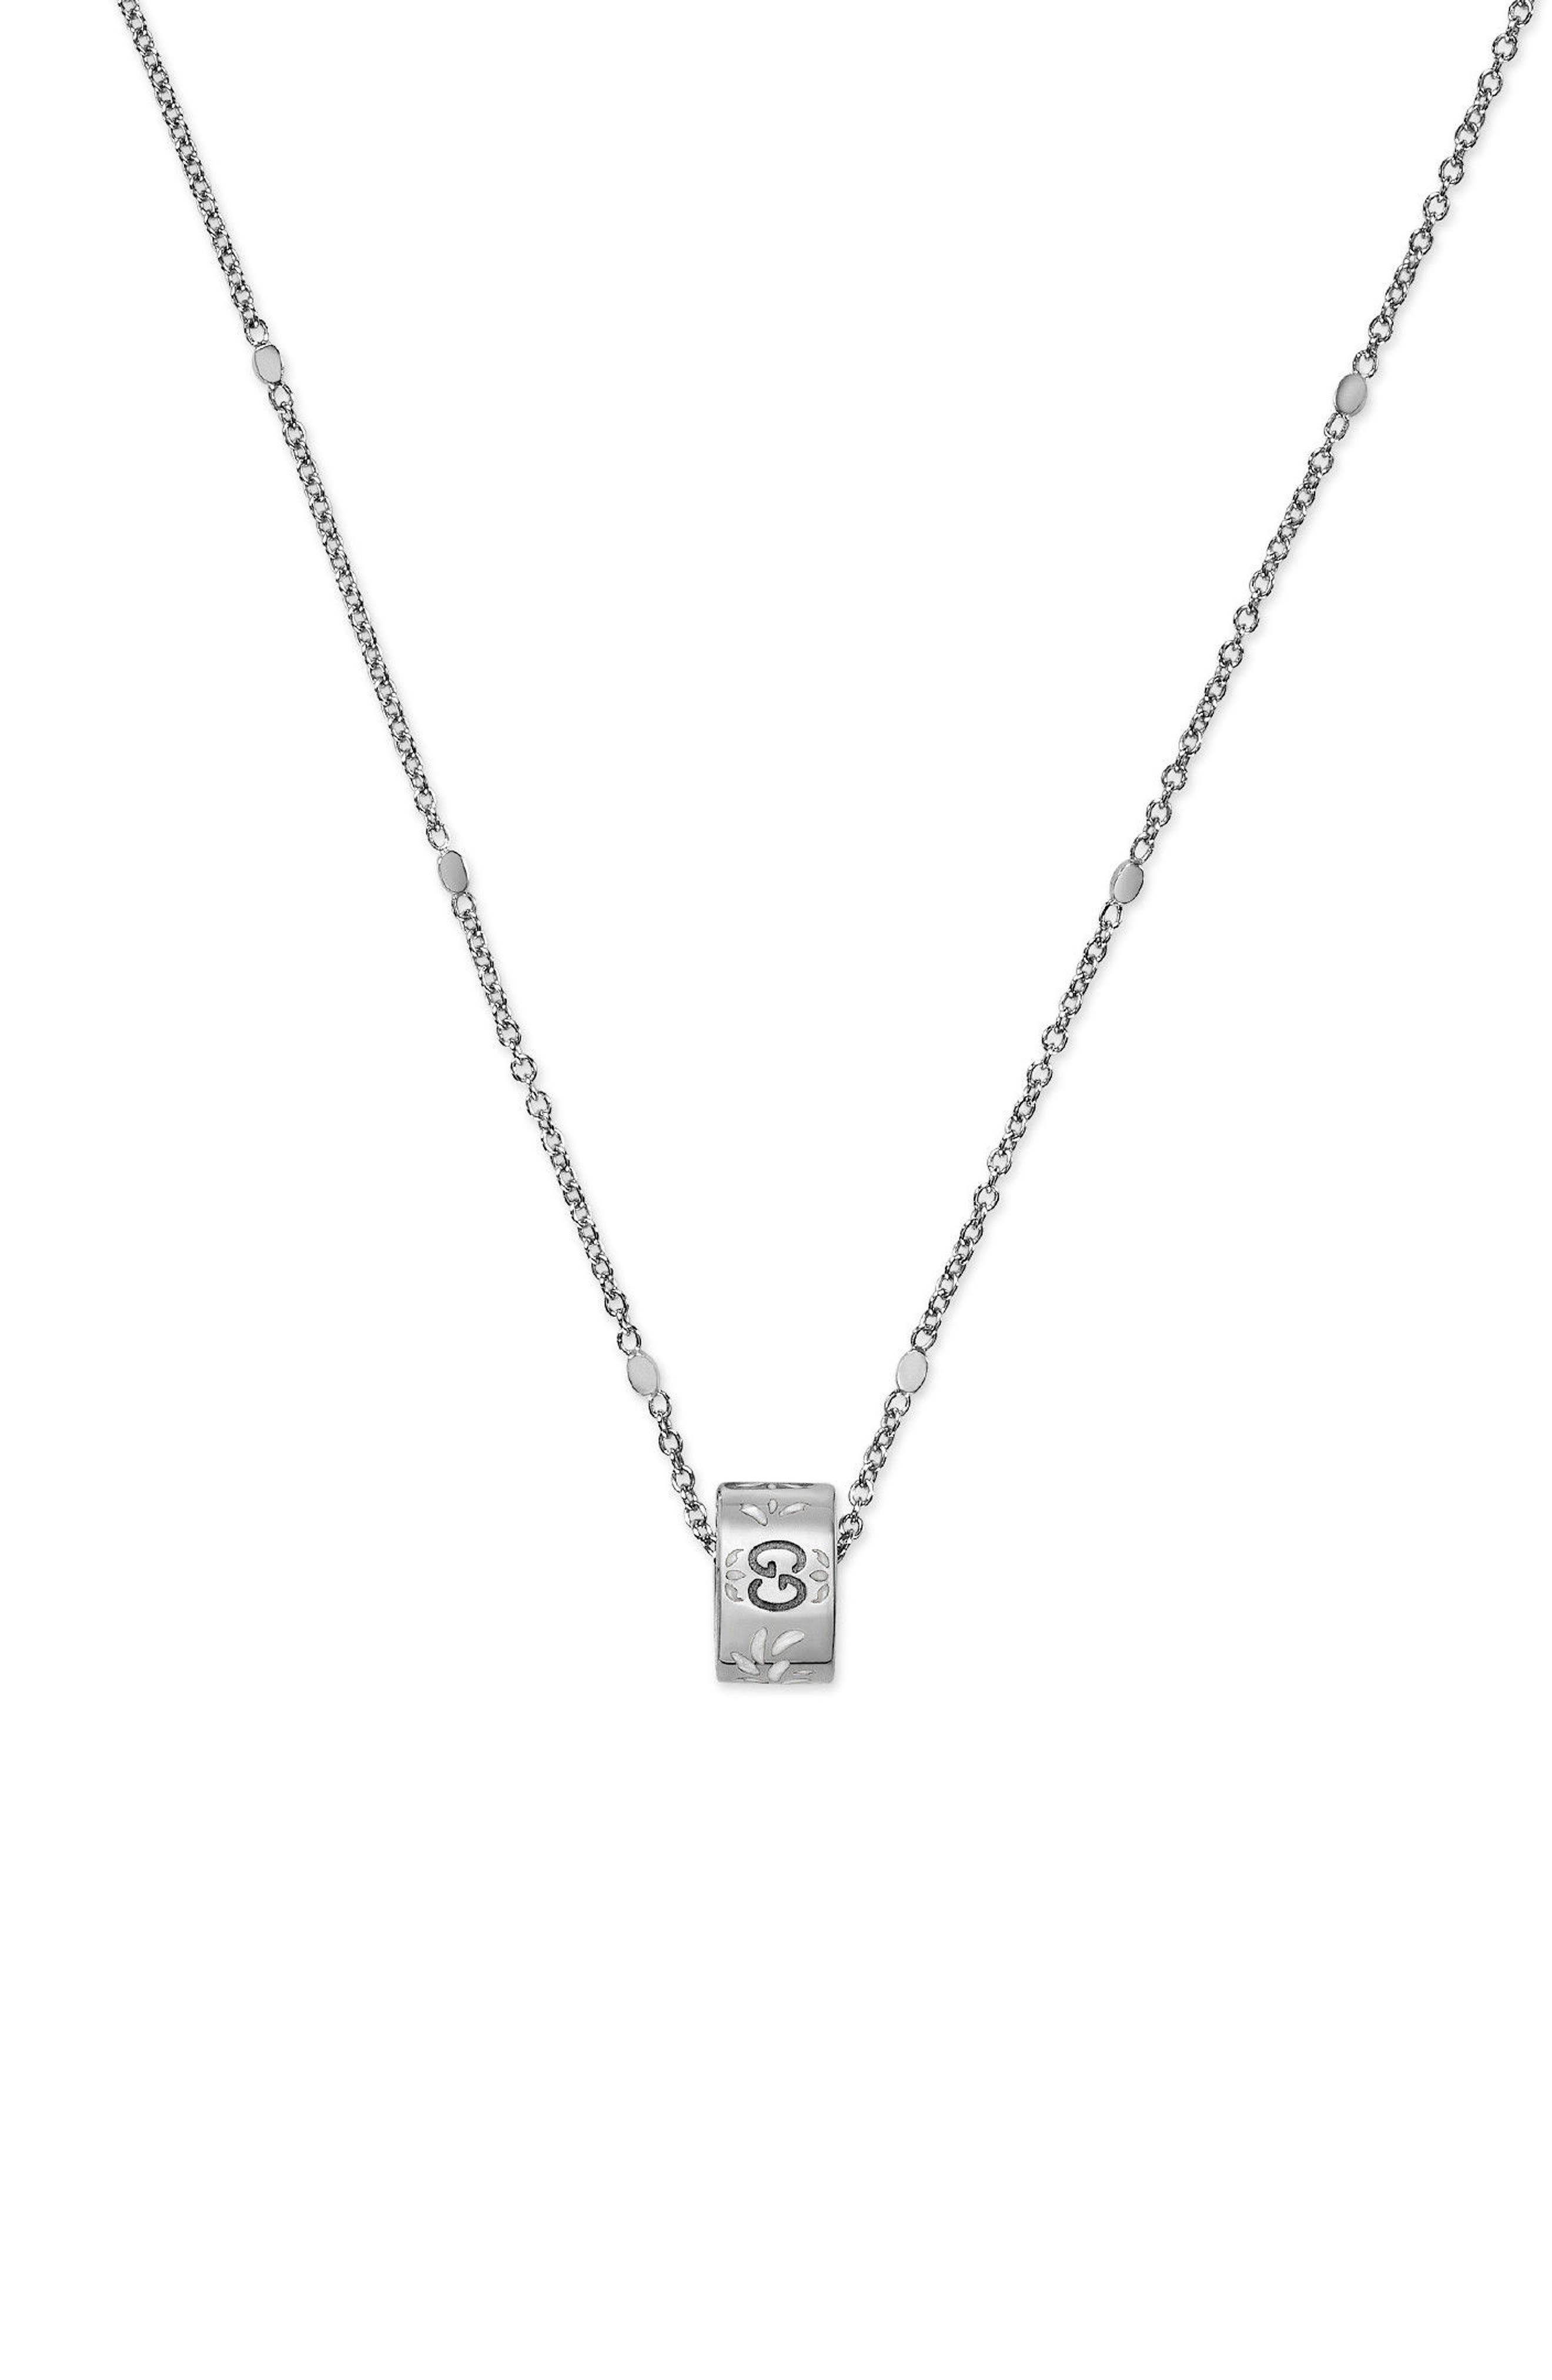 Icon Pendant Necklace,                         Main,                         color, WHITE GOLD